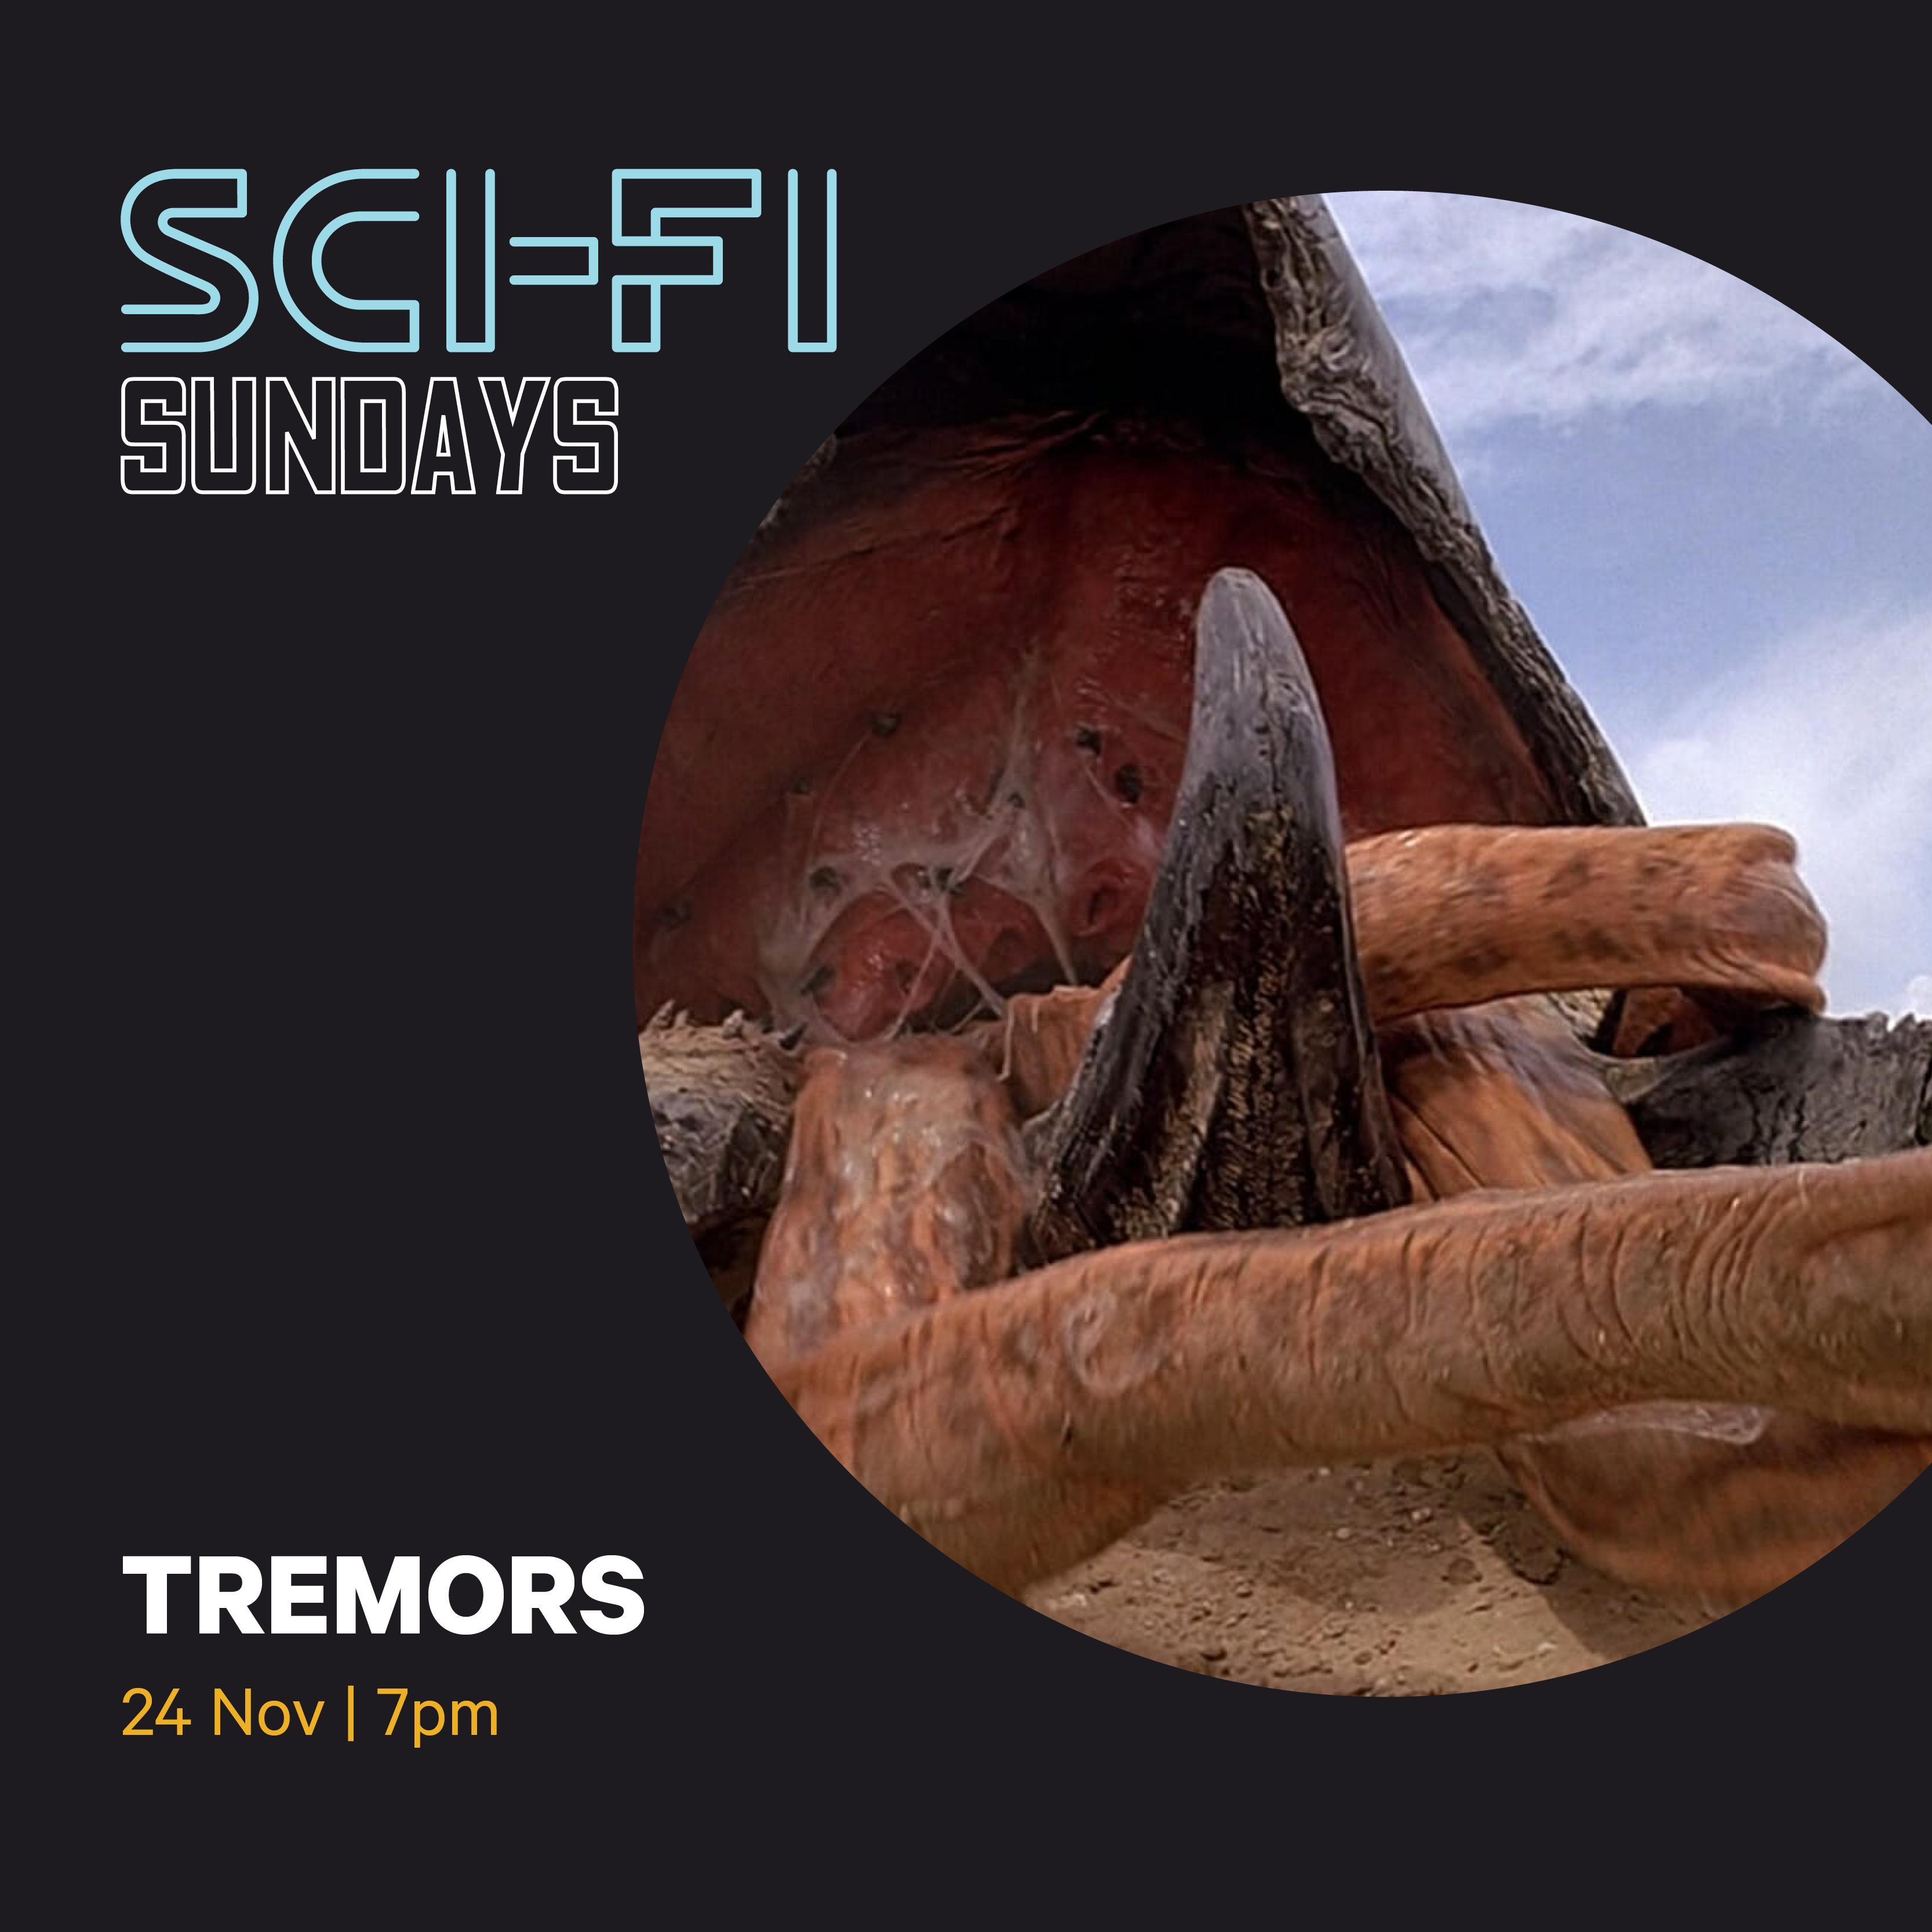 Sci Fi Sundays: Tremors